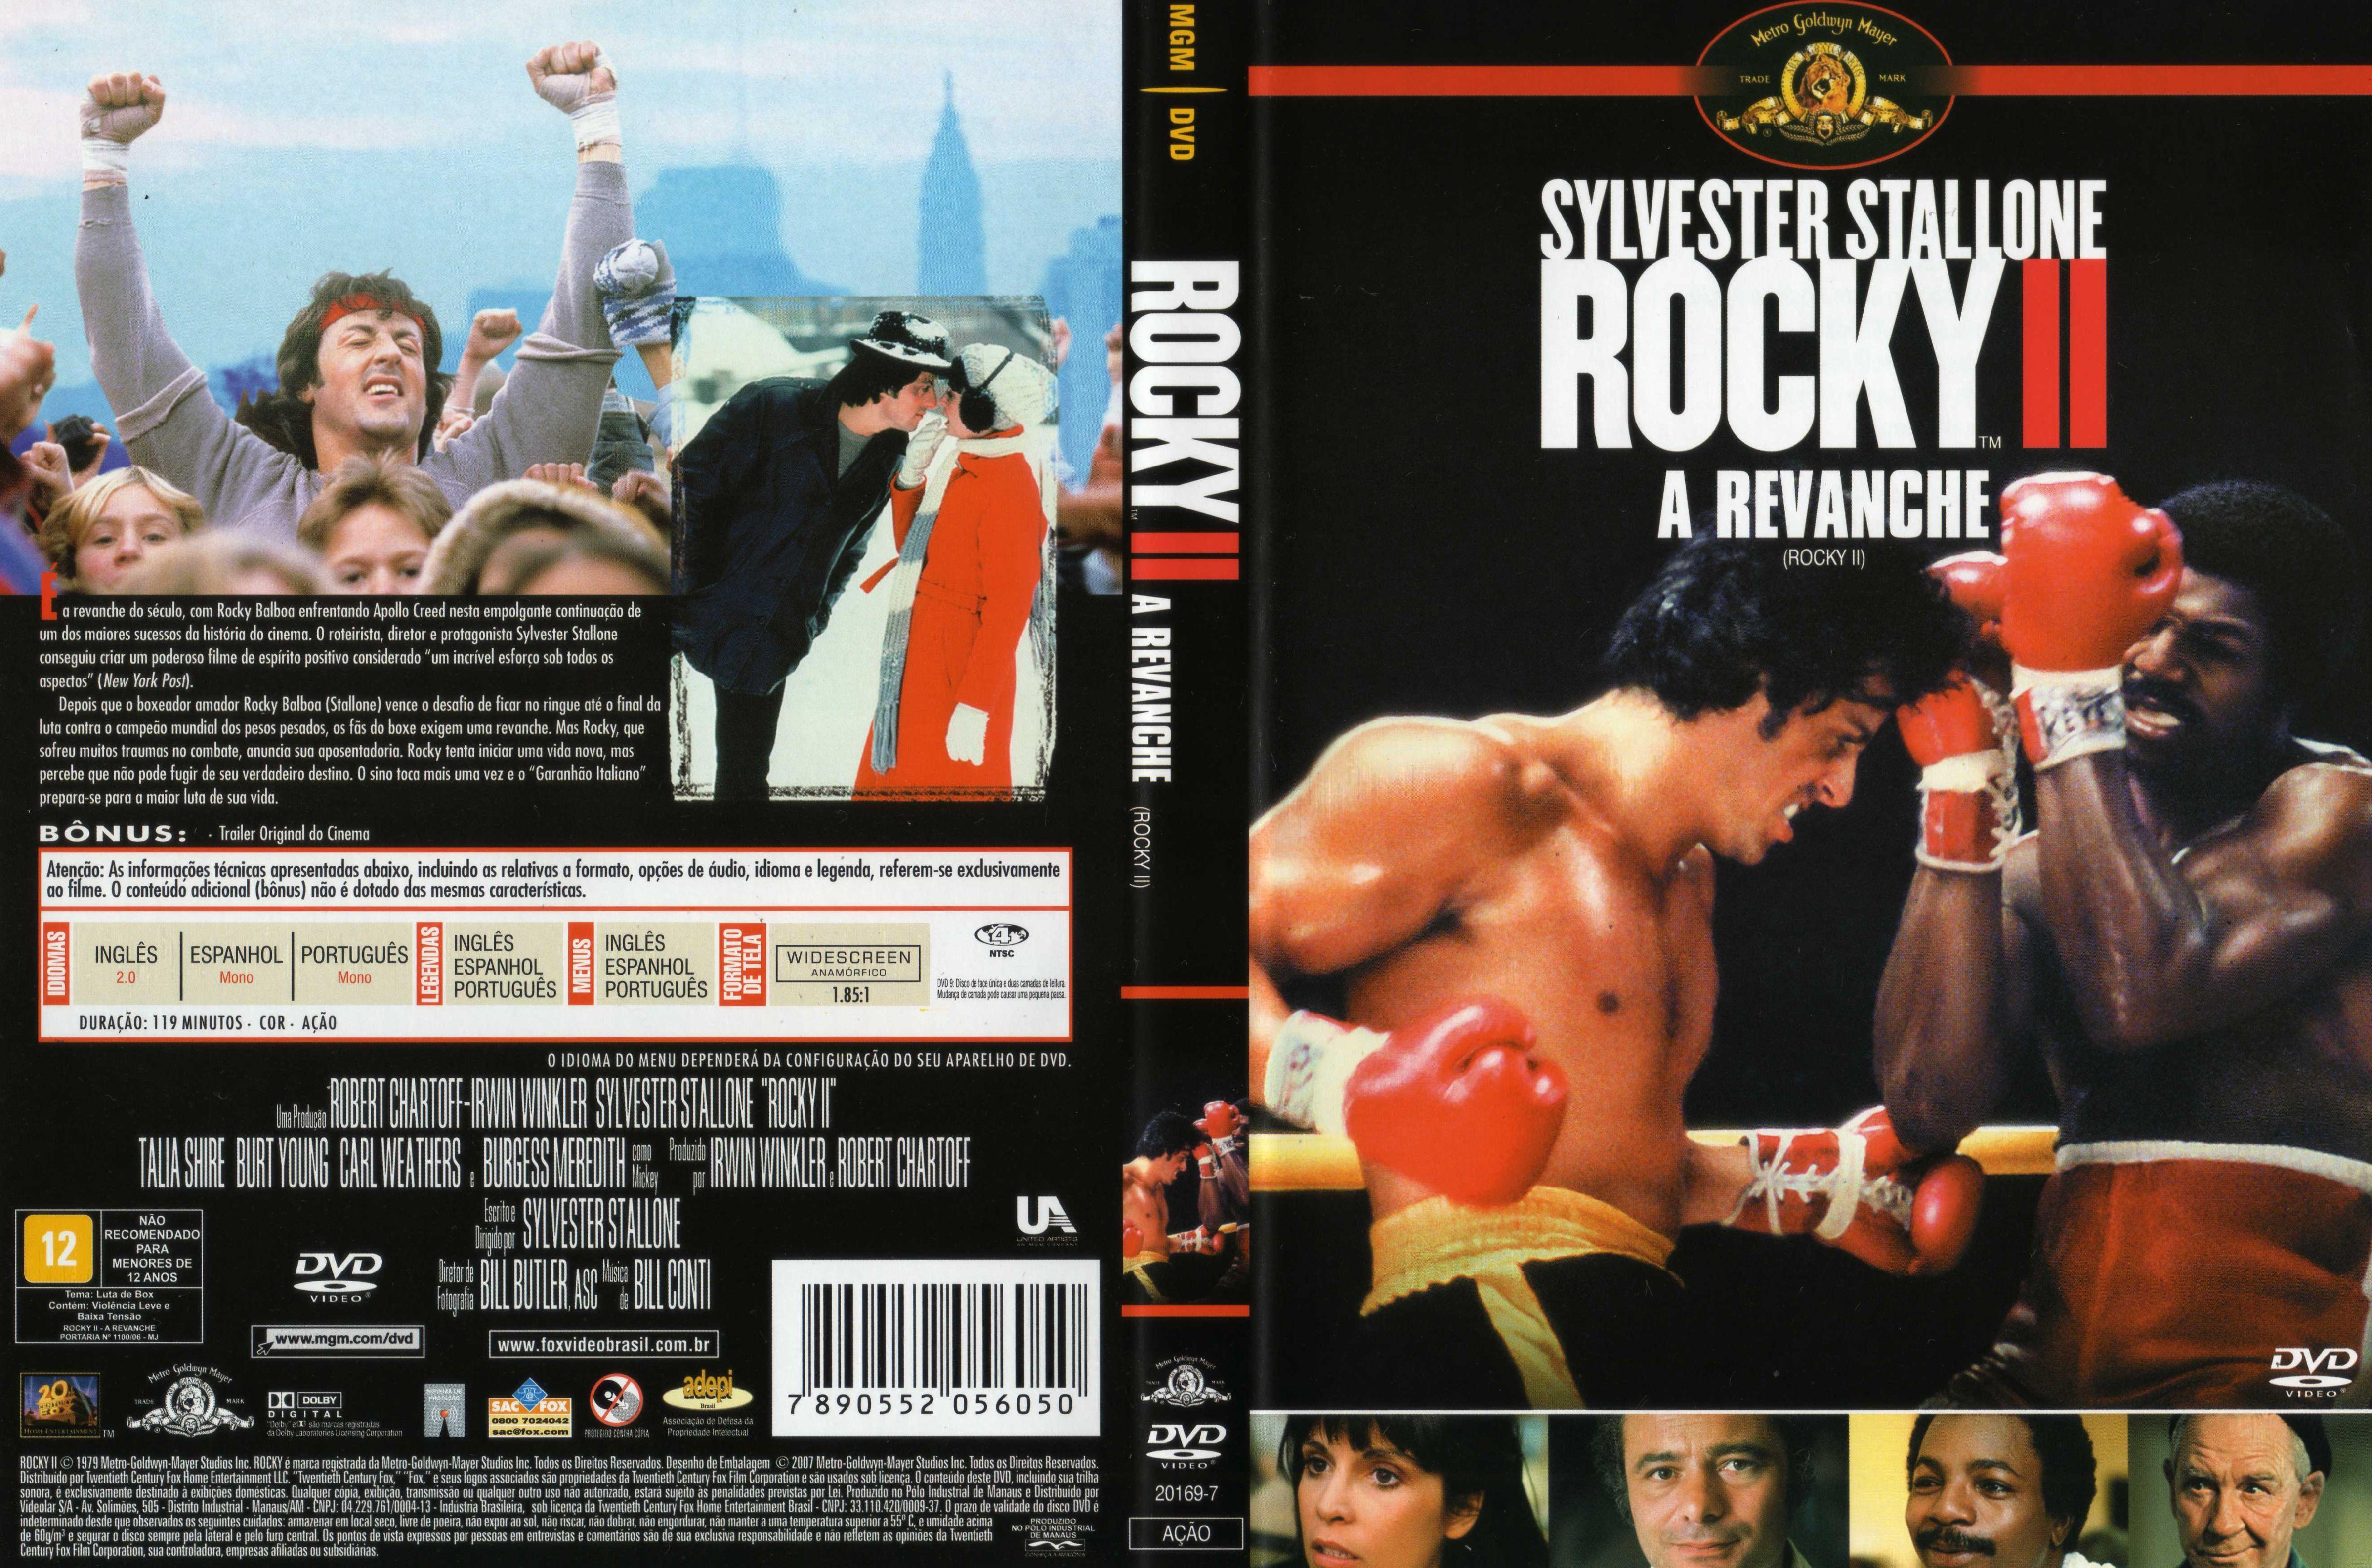 RockyIIARevanche